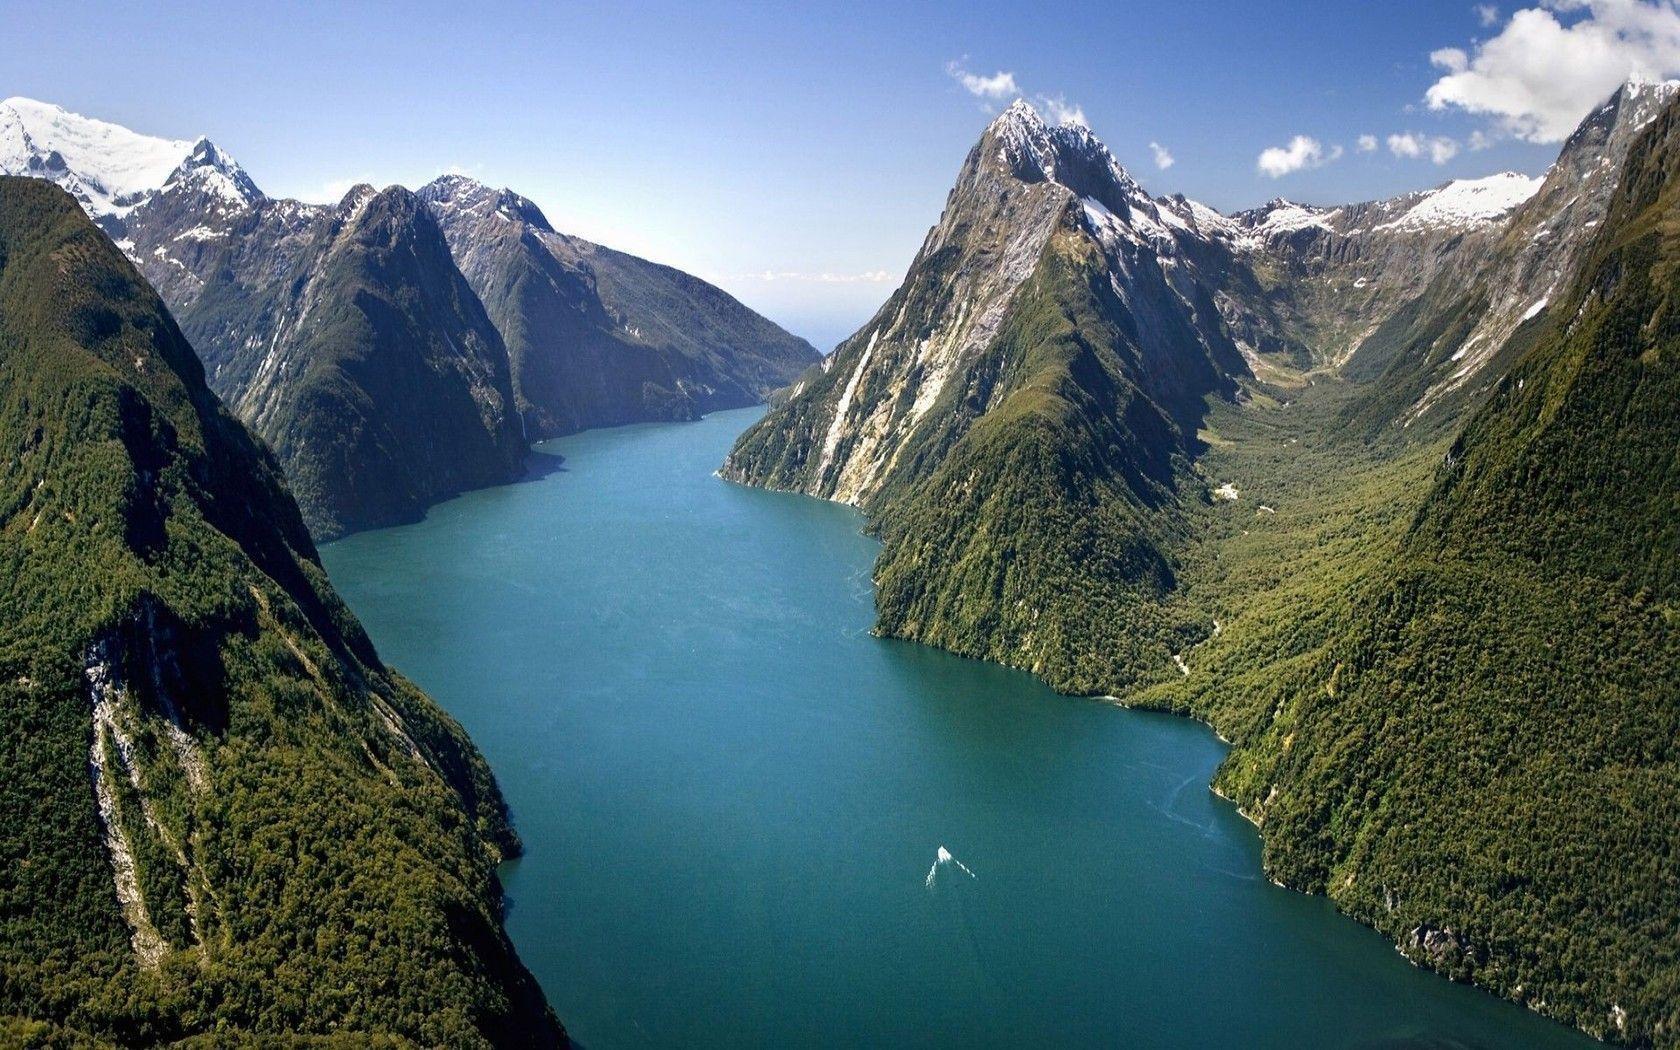 Pelaku Penembakan New Zealand Wallpaper: Milford Sound Wallpapers